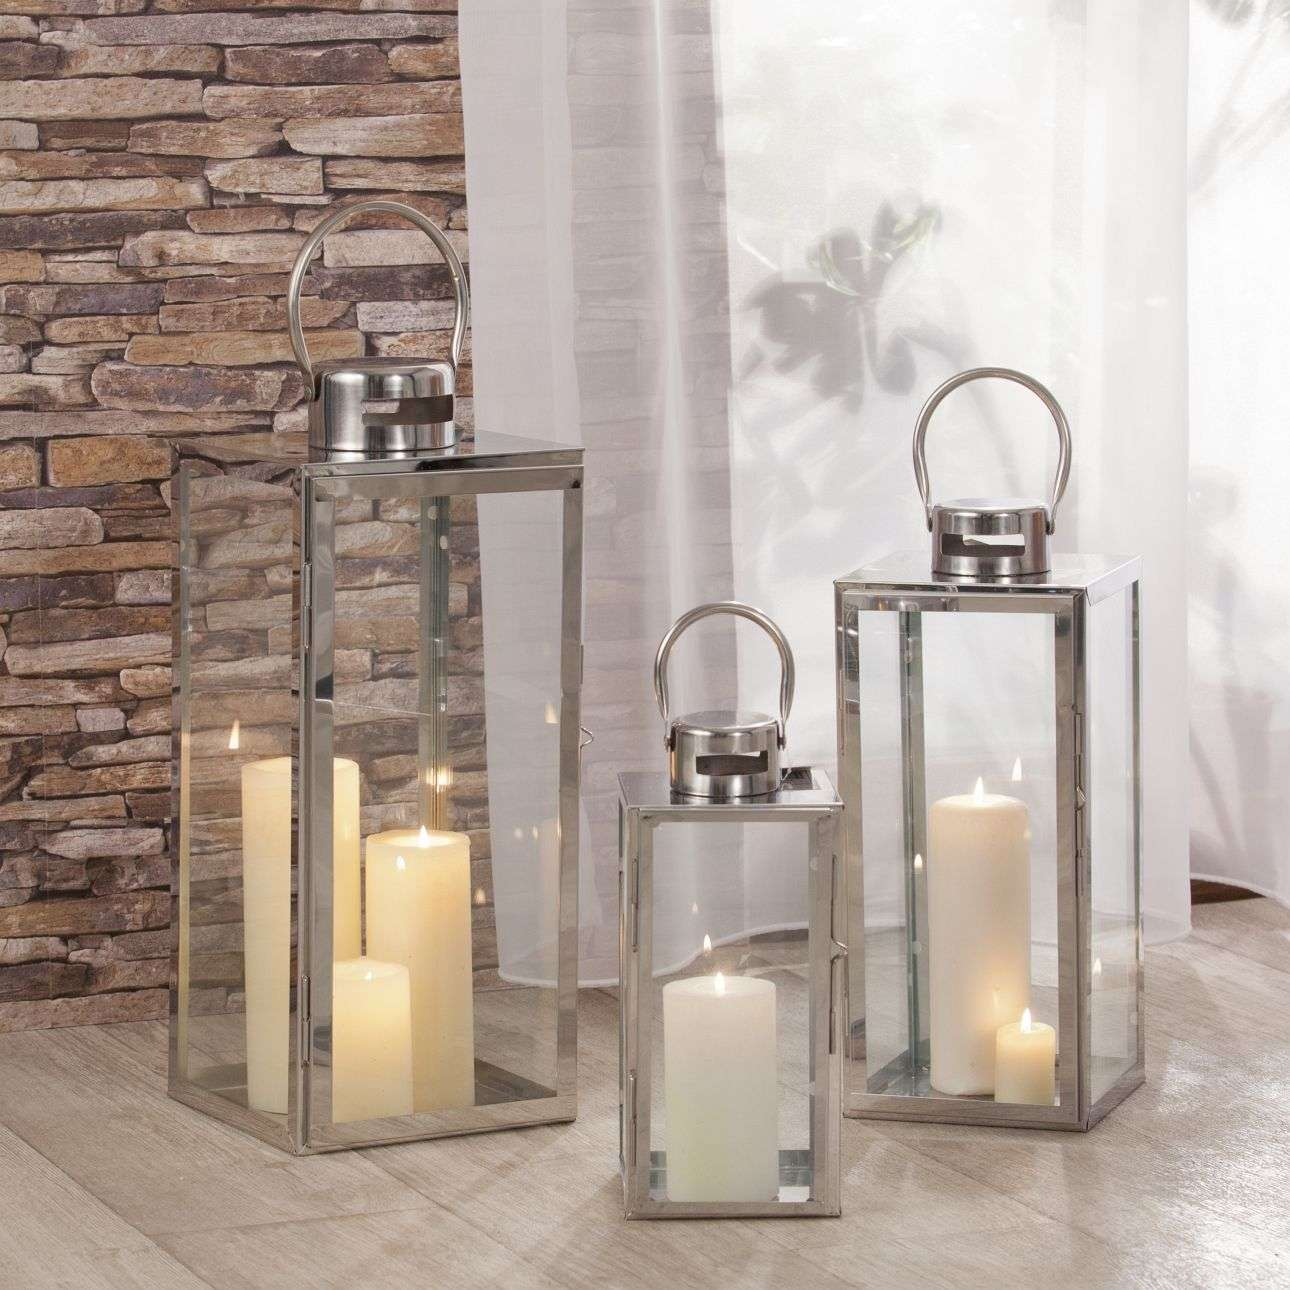 Latarnia Elegance Silver 13x13x29 cm 13x13x29cm